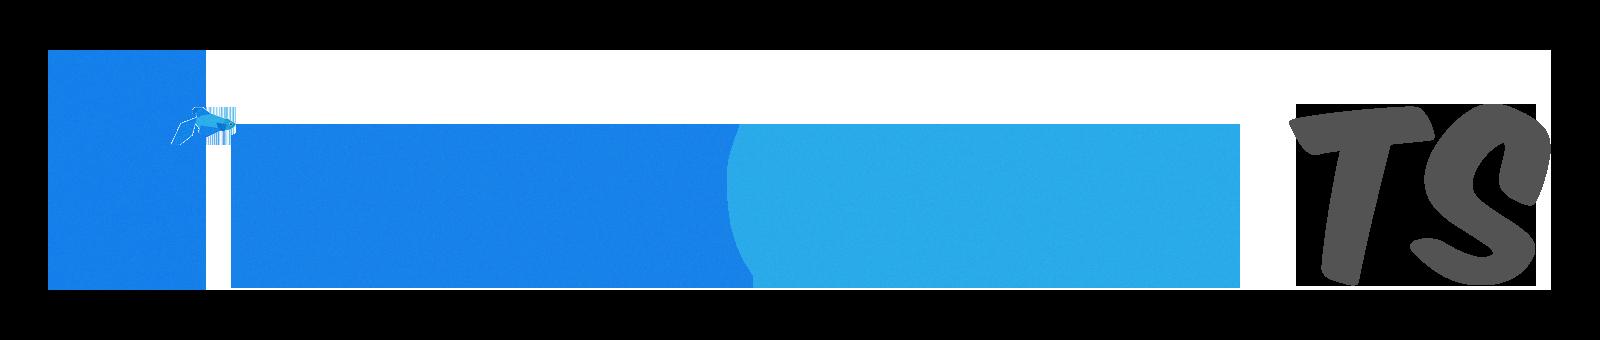 2018 BetaChat TS Logo